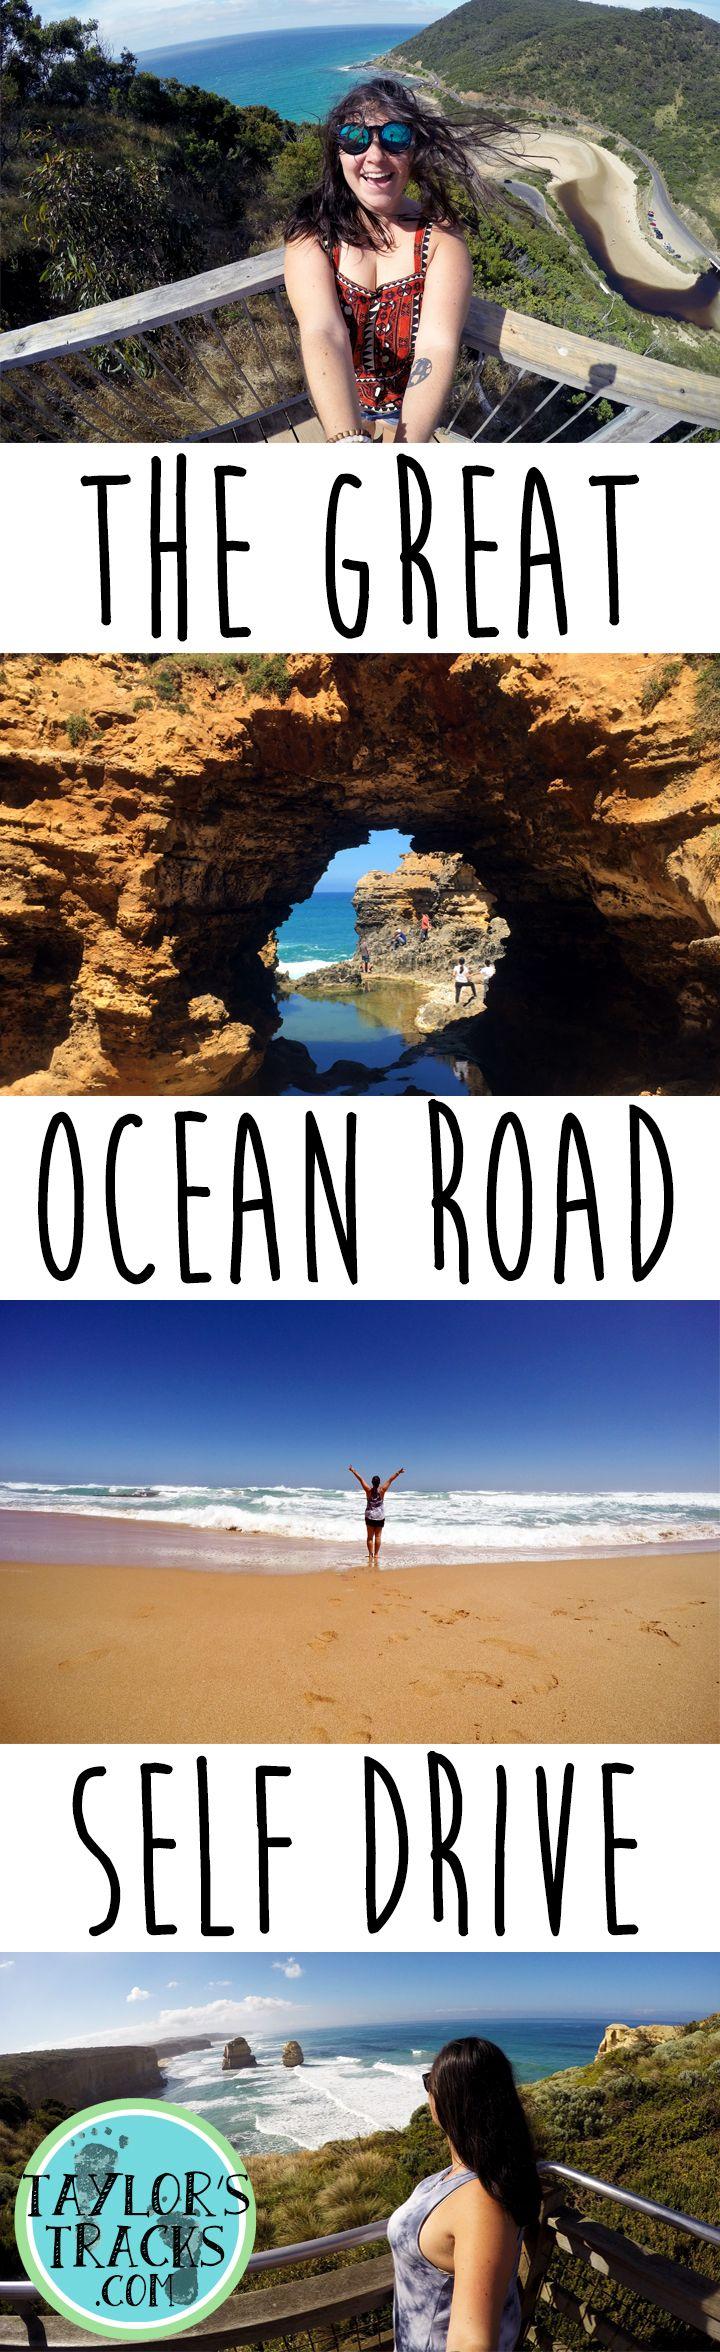 The Great Ocean Road Self Drive www.taylorstracks.com